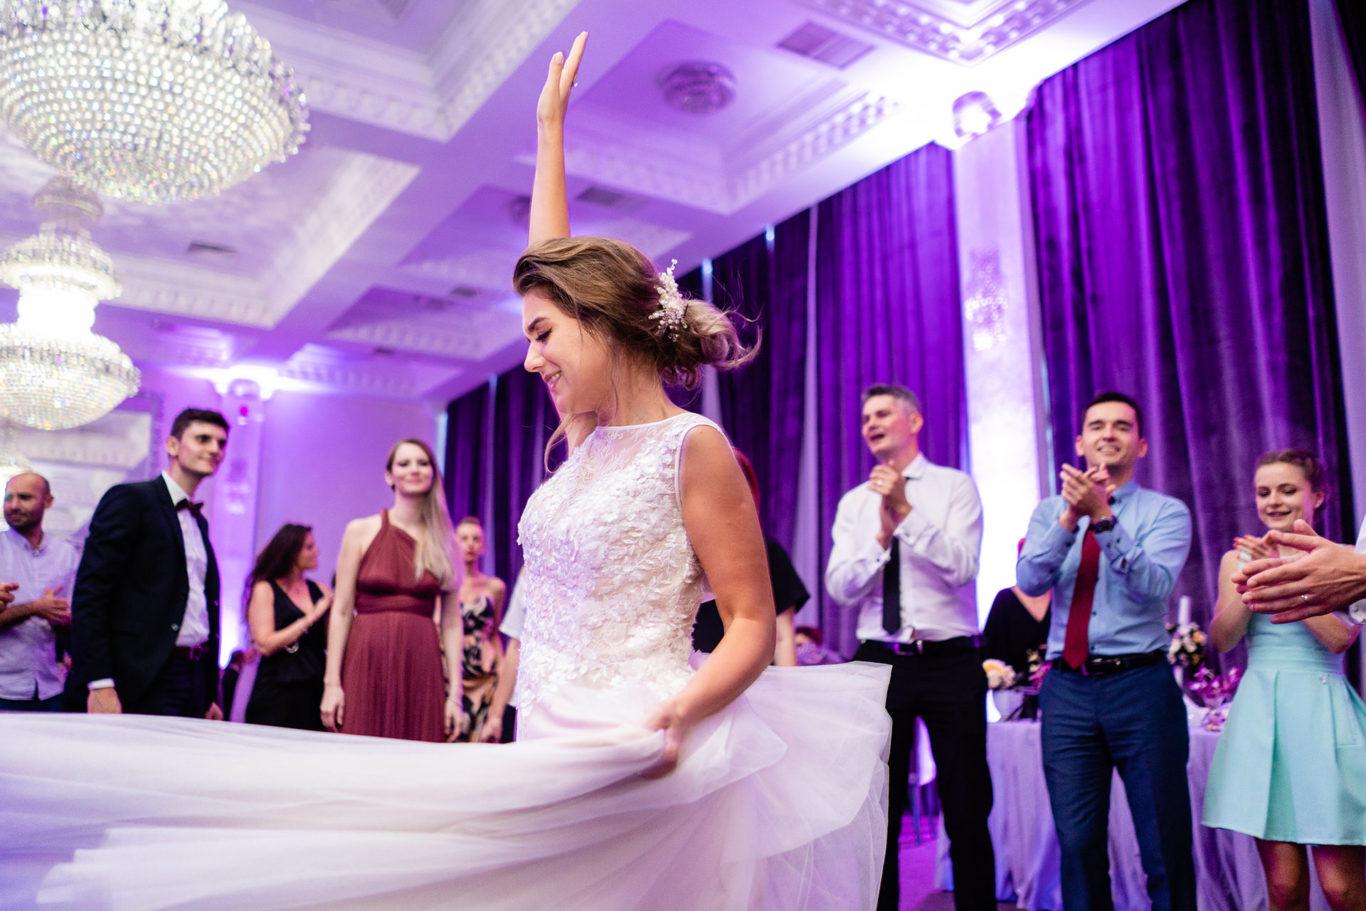 Nunta mov - Carmen & Mihai - fotograf nunta Bucuresti - Ciprian Dumitrescu - fotografie nunta Bucuresti - Rebeca Ballroom